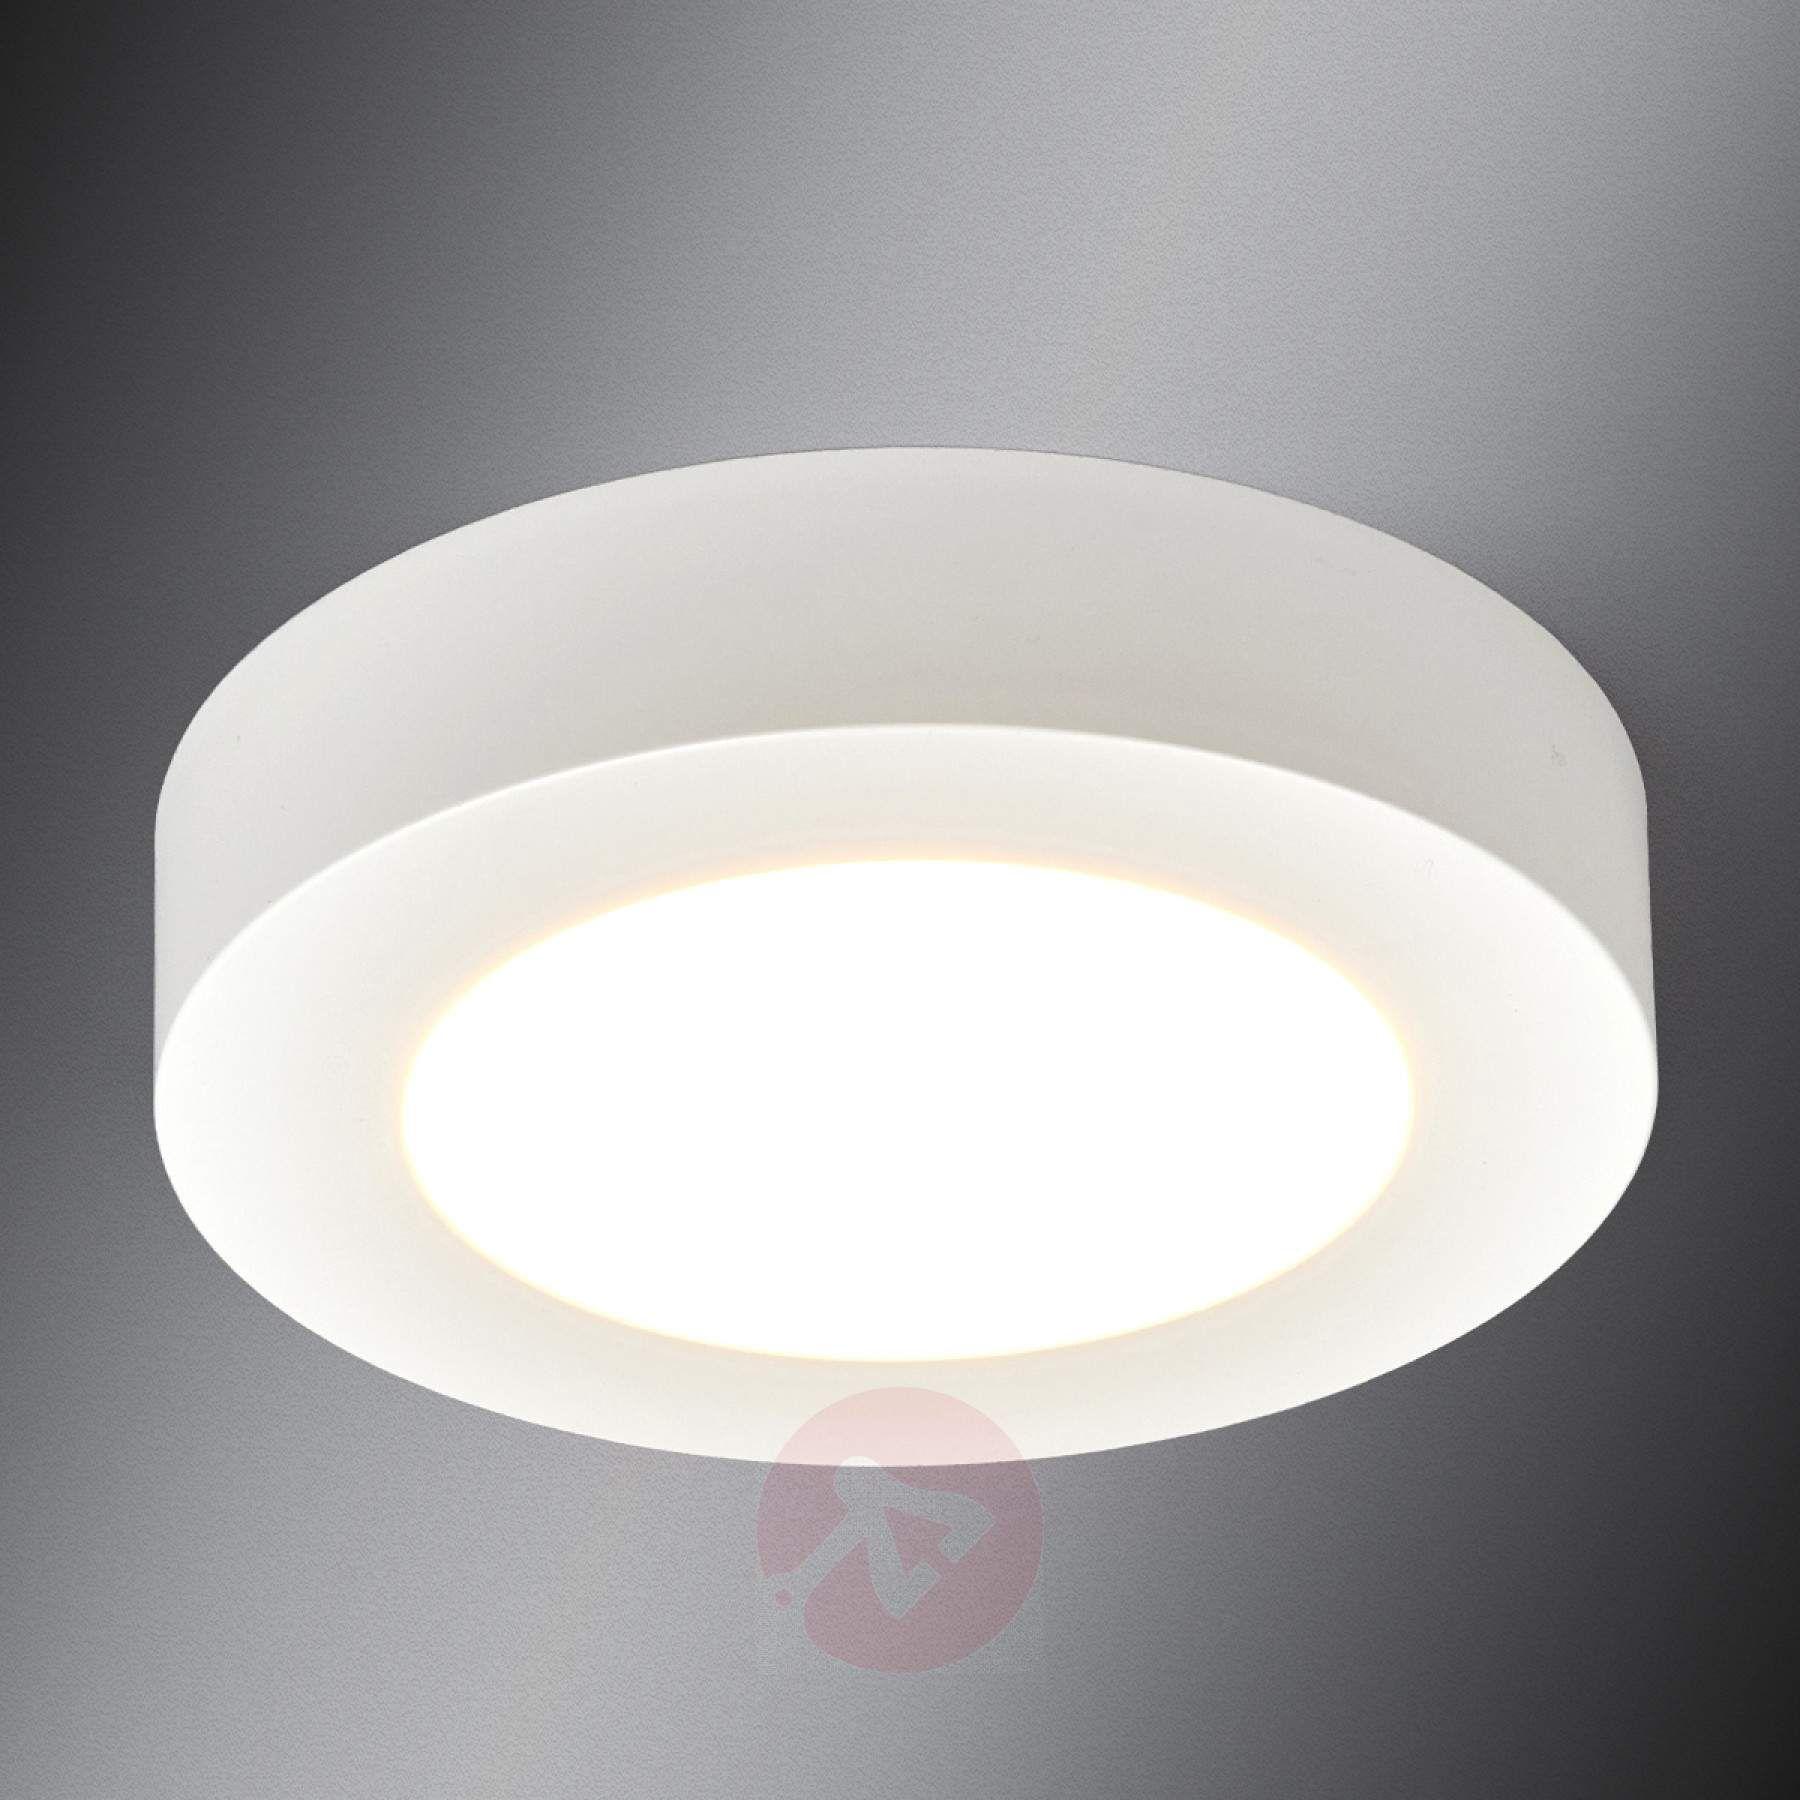 Round Led Ceiling Lamp Esra For Bathrooms Lights Co Uk Led